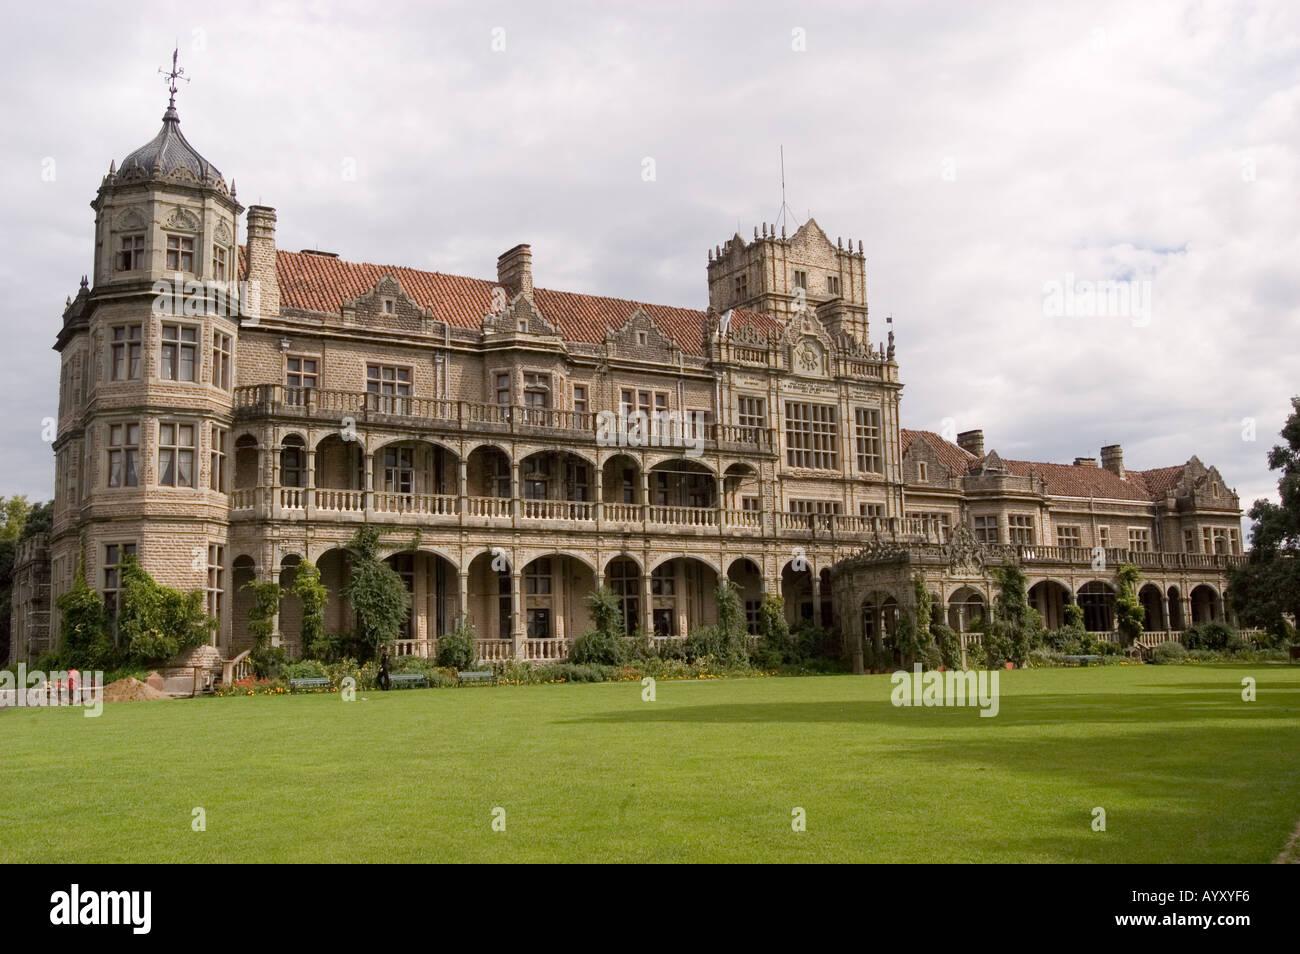 Best Kitchen Gallery: Indian Institute Of Advanced Studies Magnificent English Renaissance of English Renaissance Architecture on rachelxblog.com